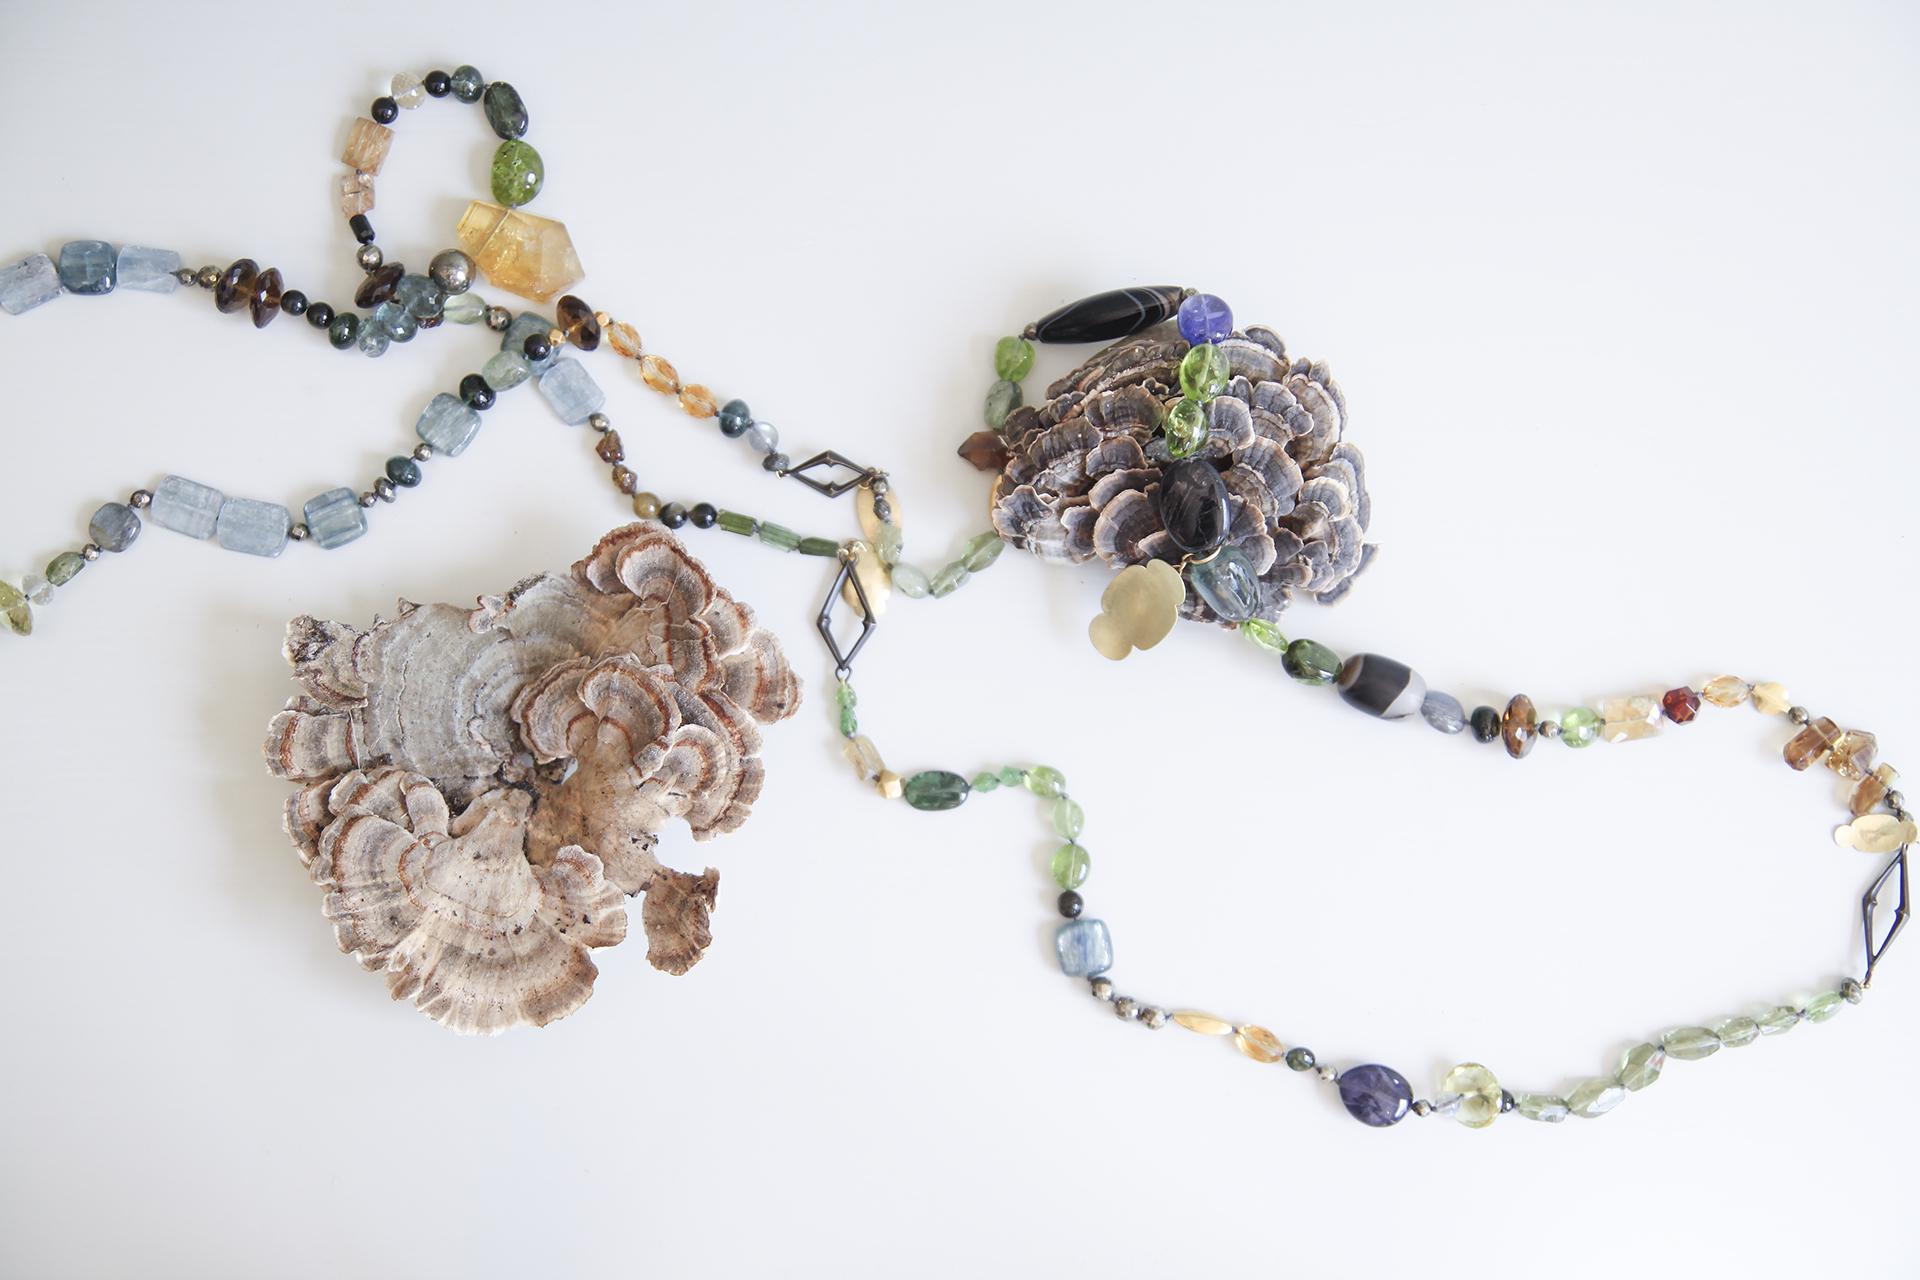 18ky Story Necklace Aquamarine, Kyanite, Tourmaline, Citrine